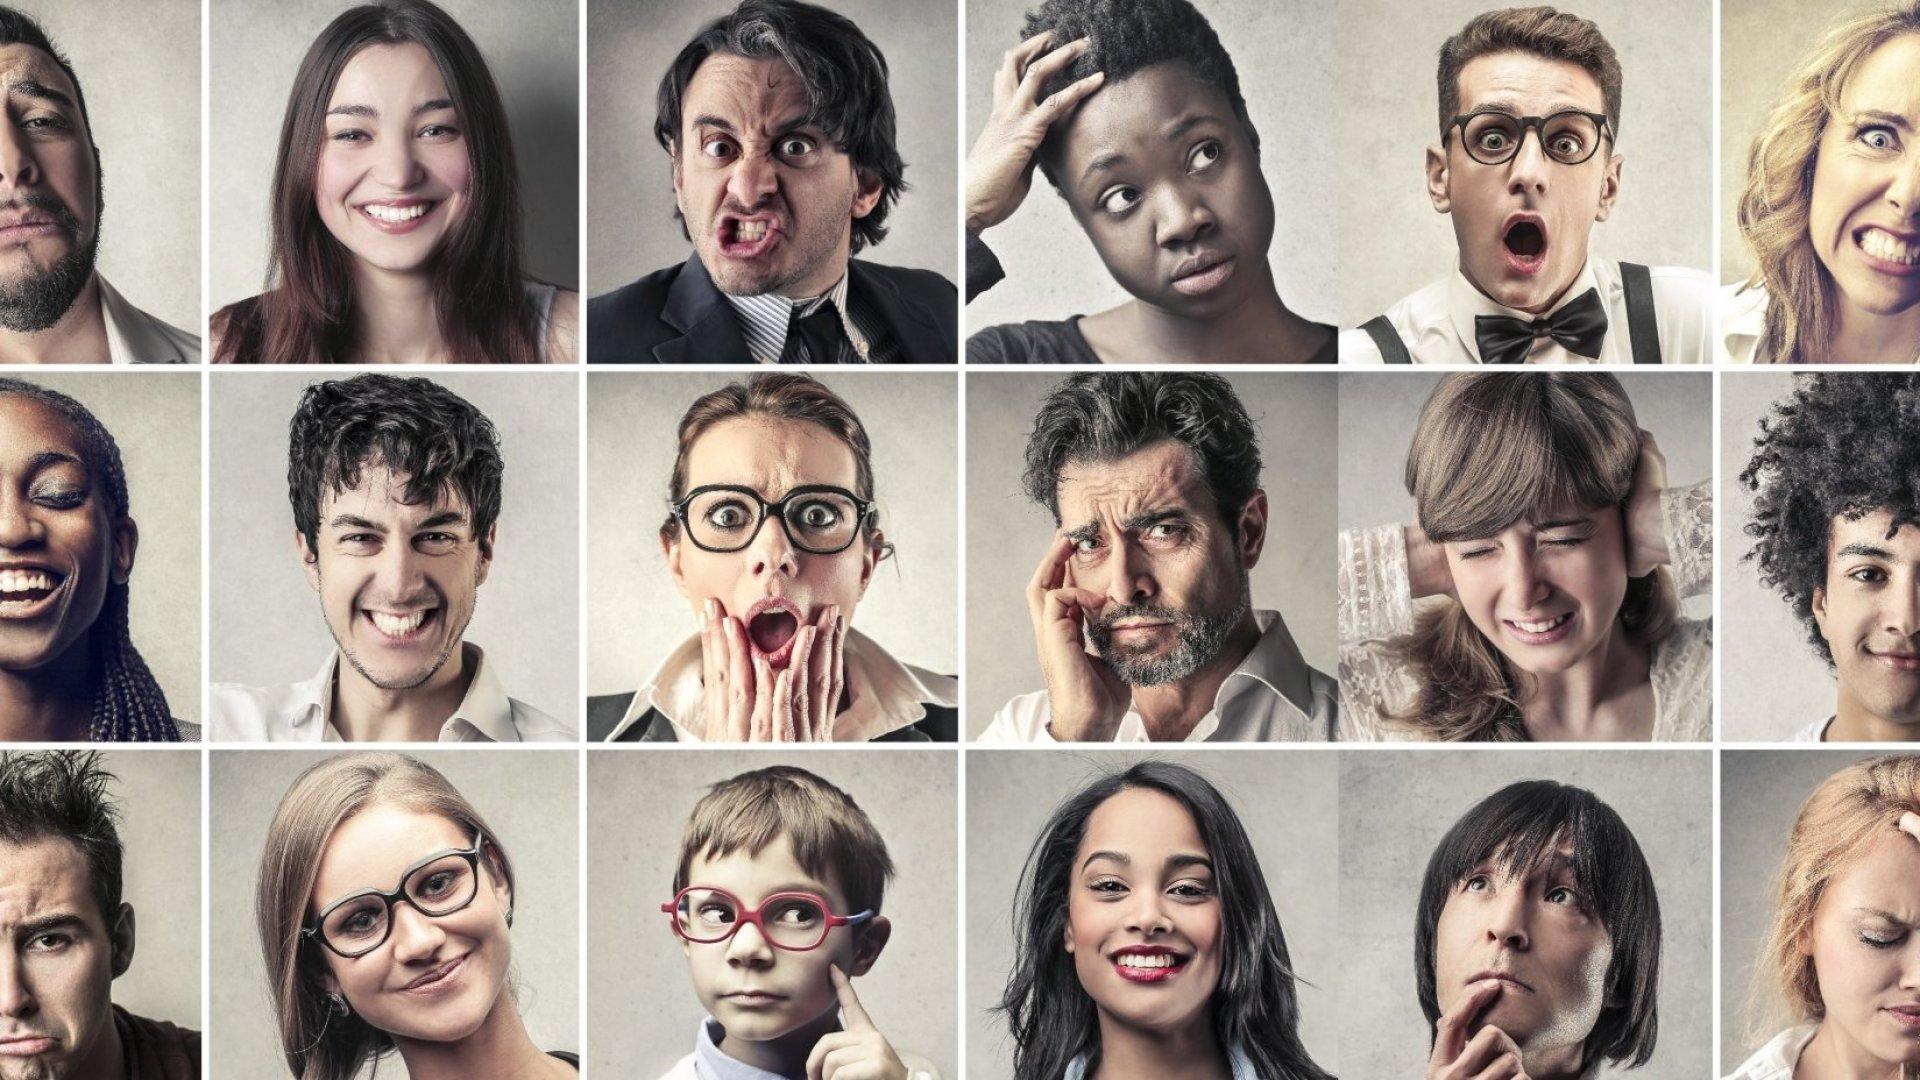 7 Strategies Emotionally Intelligent People Use to Keep Their Feelings Under Control